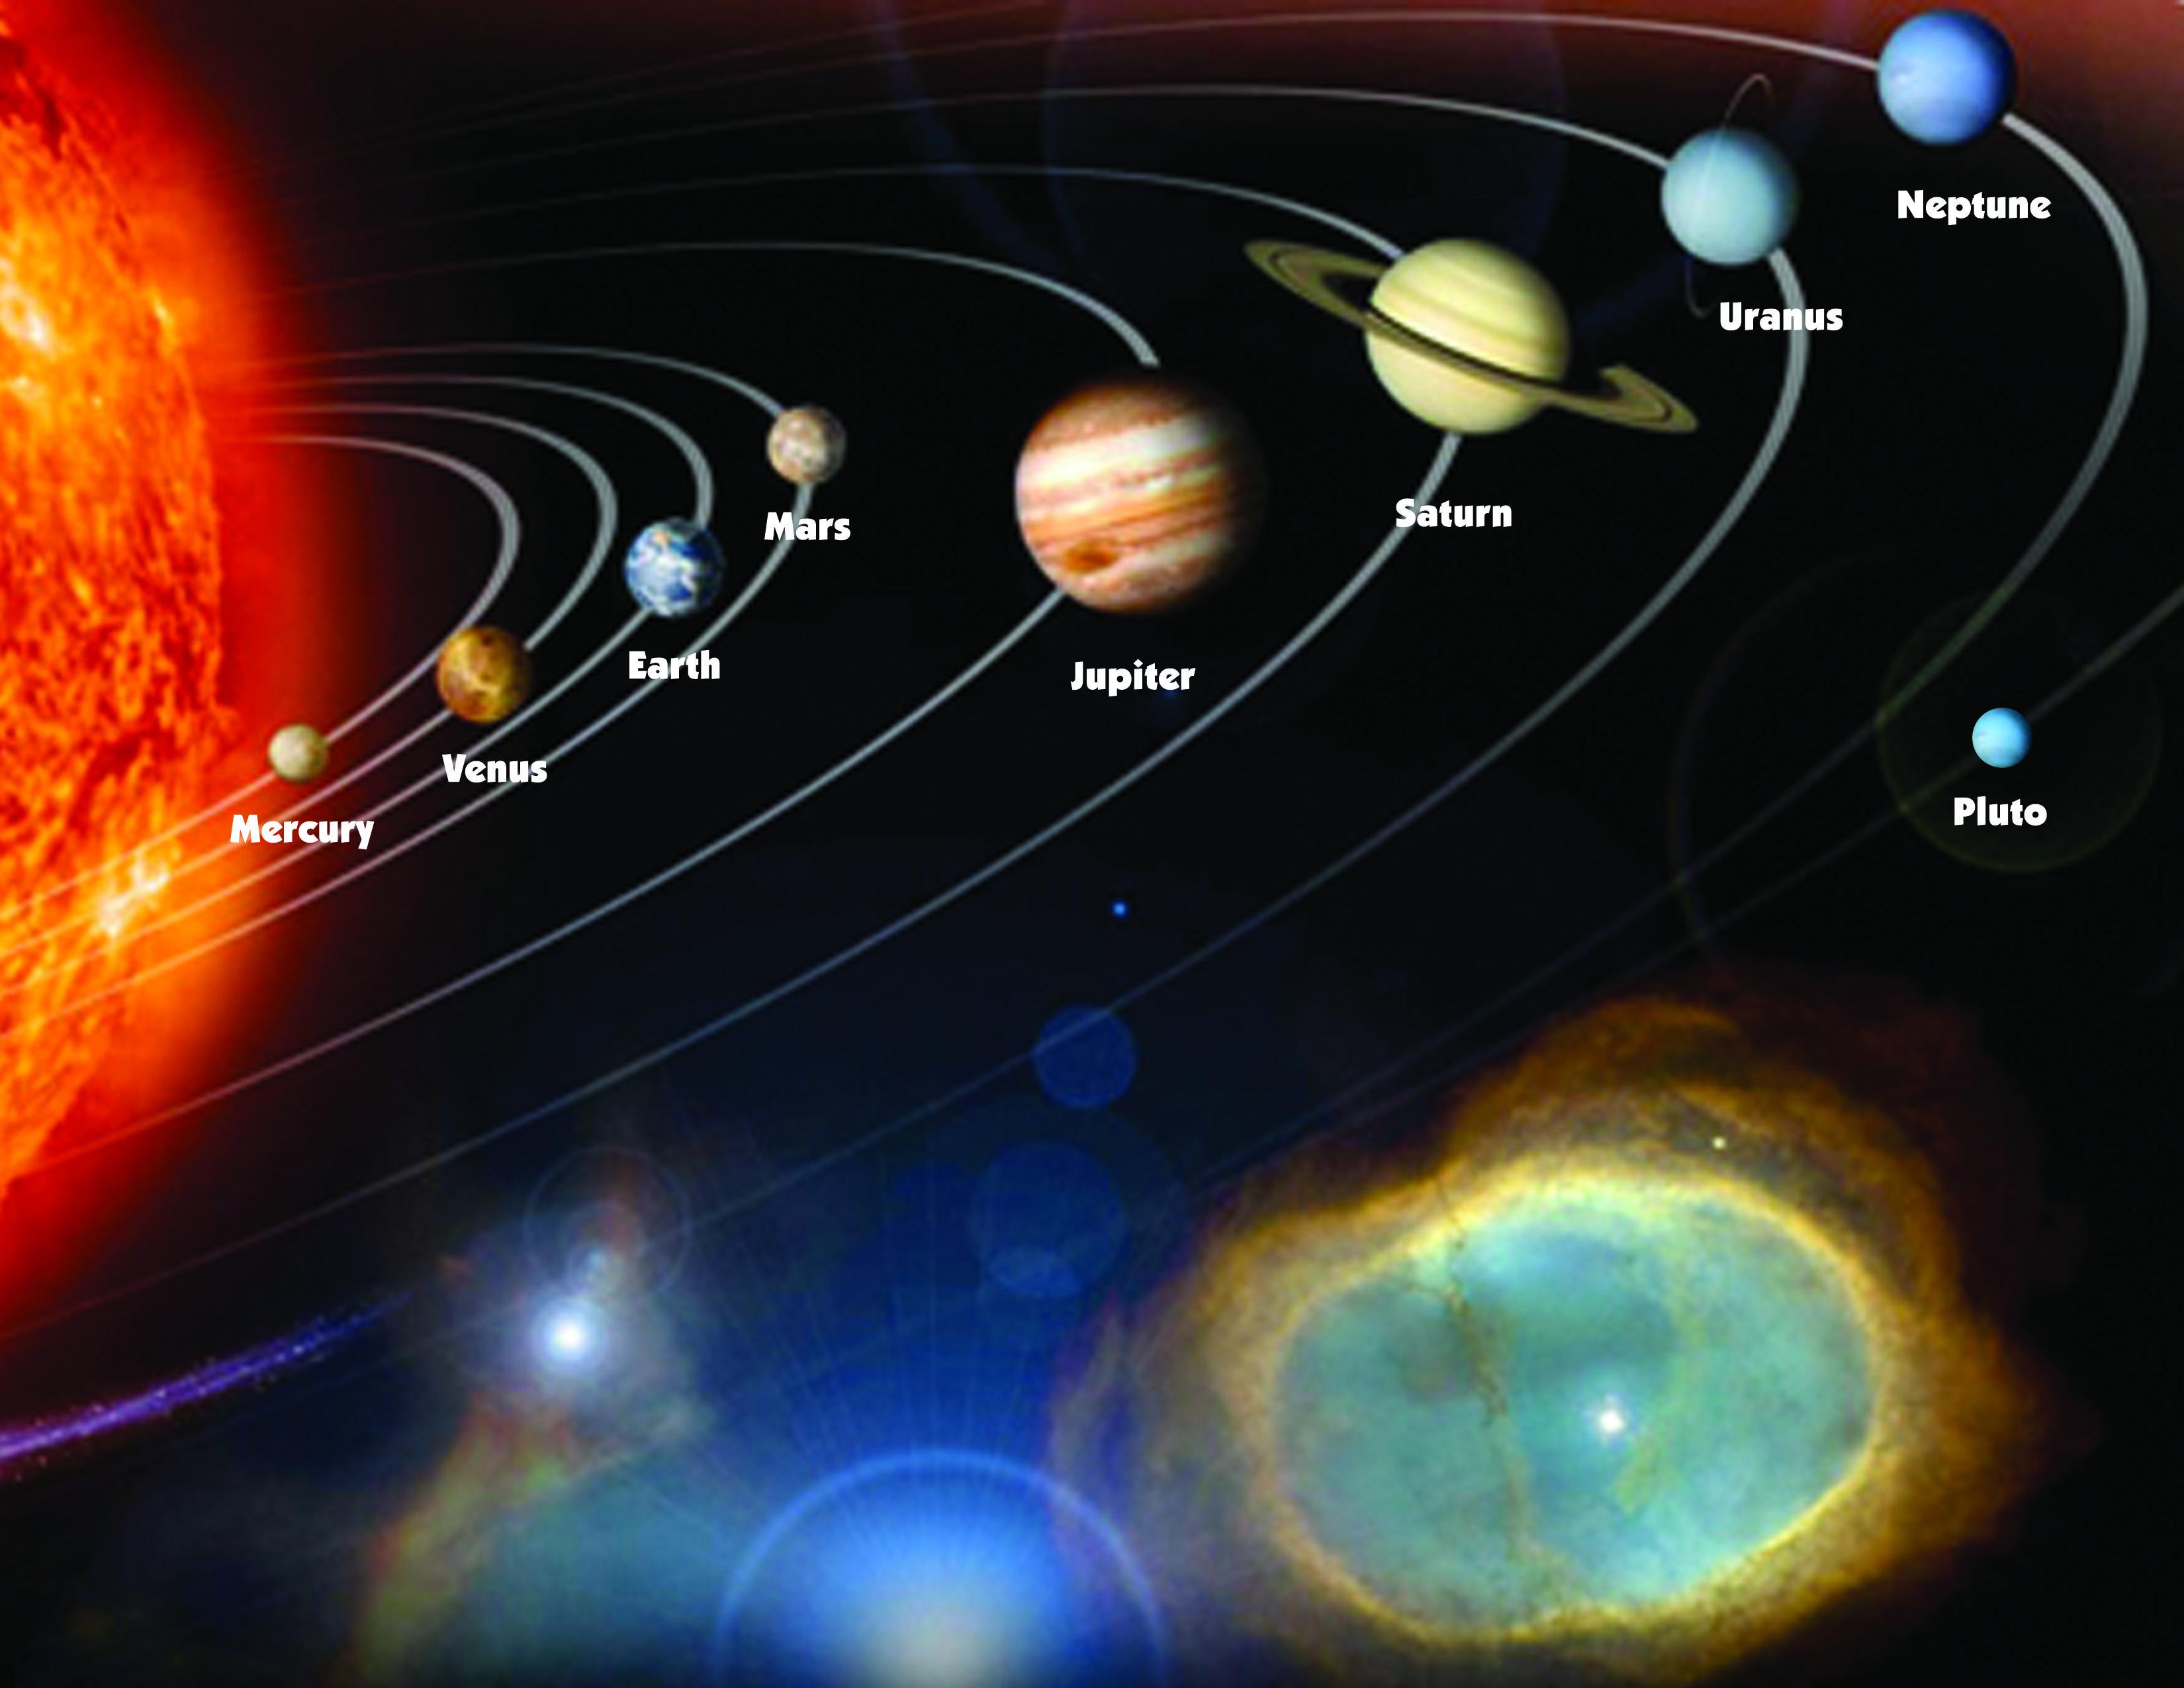 Printable solar system diagram | VBS 2014 | Pinterest